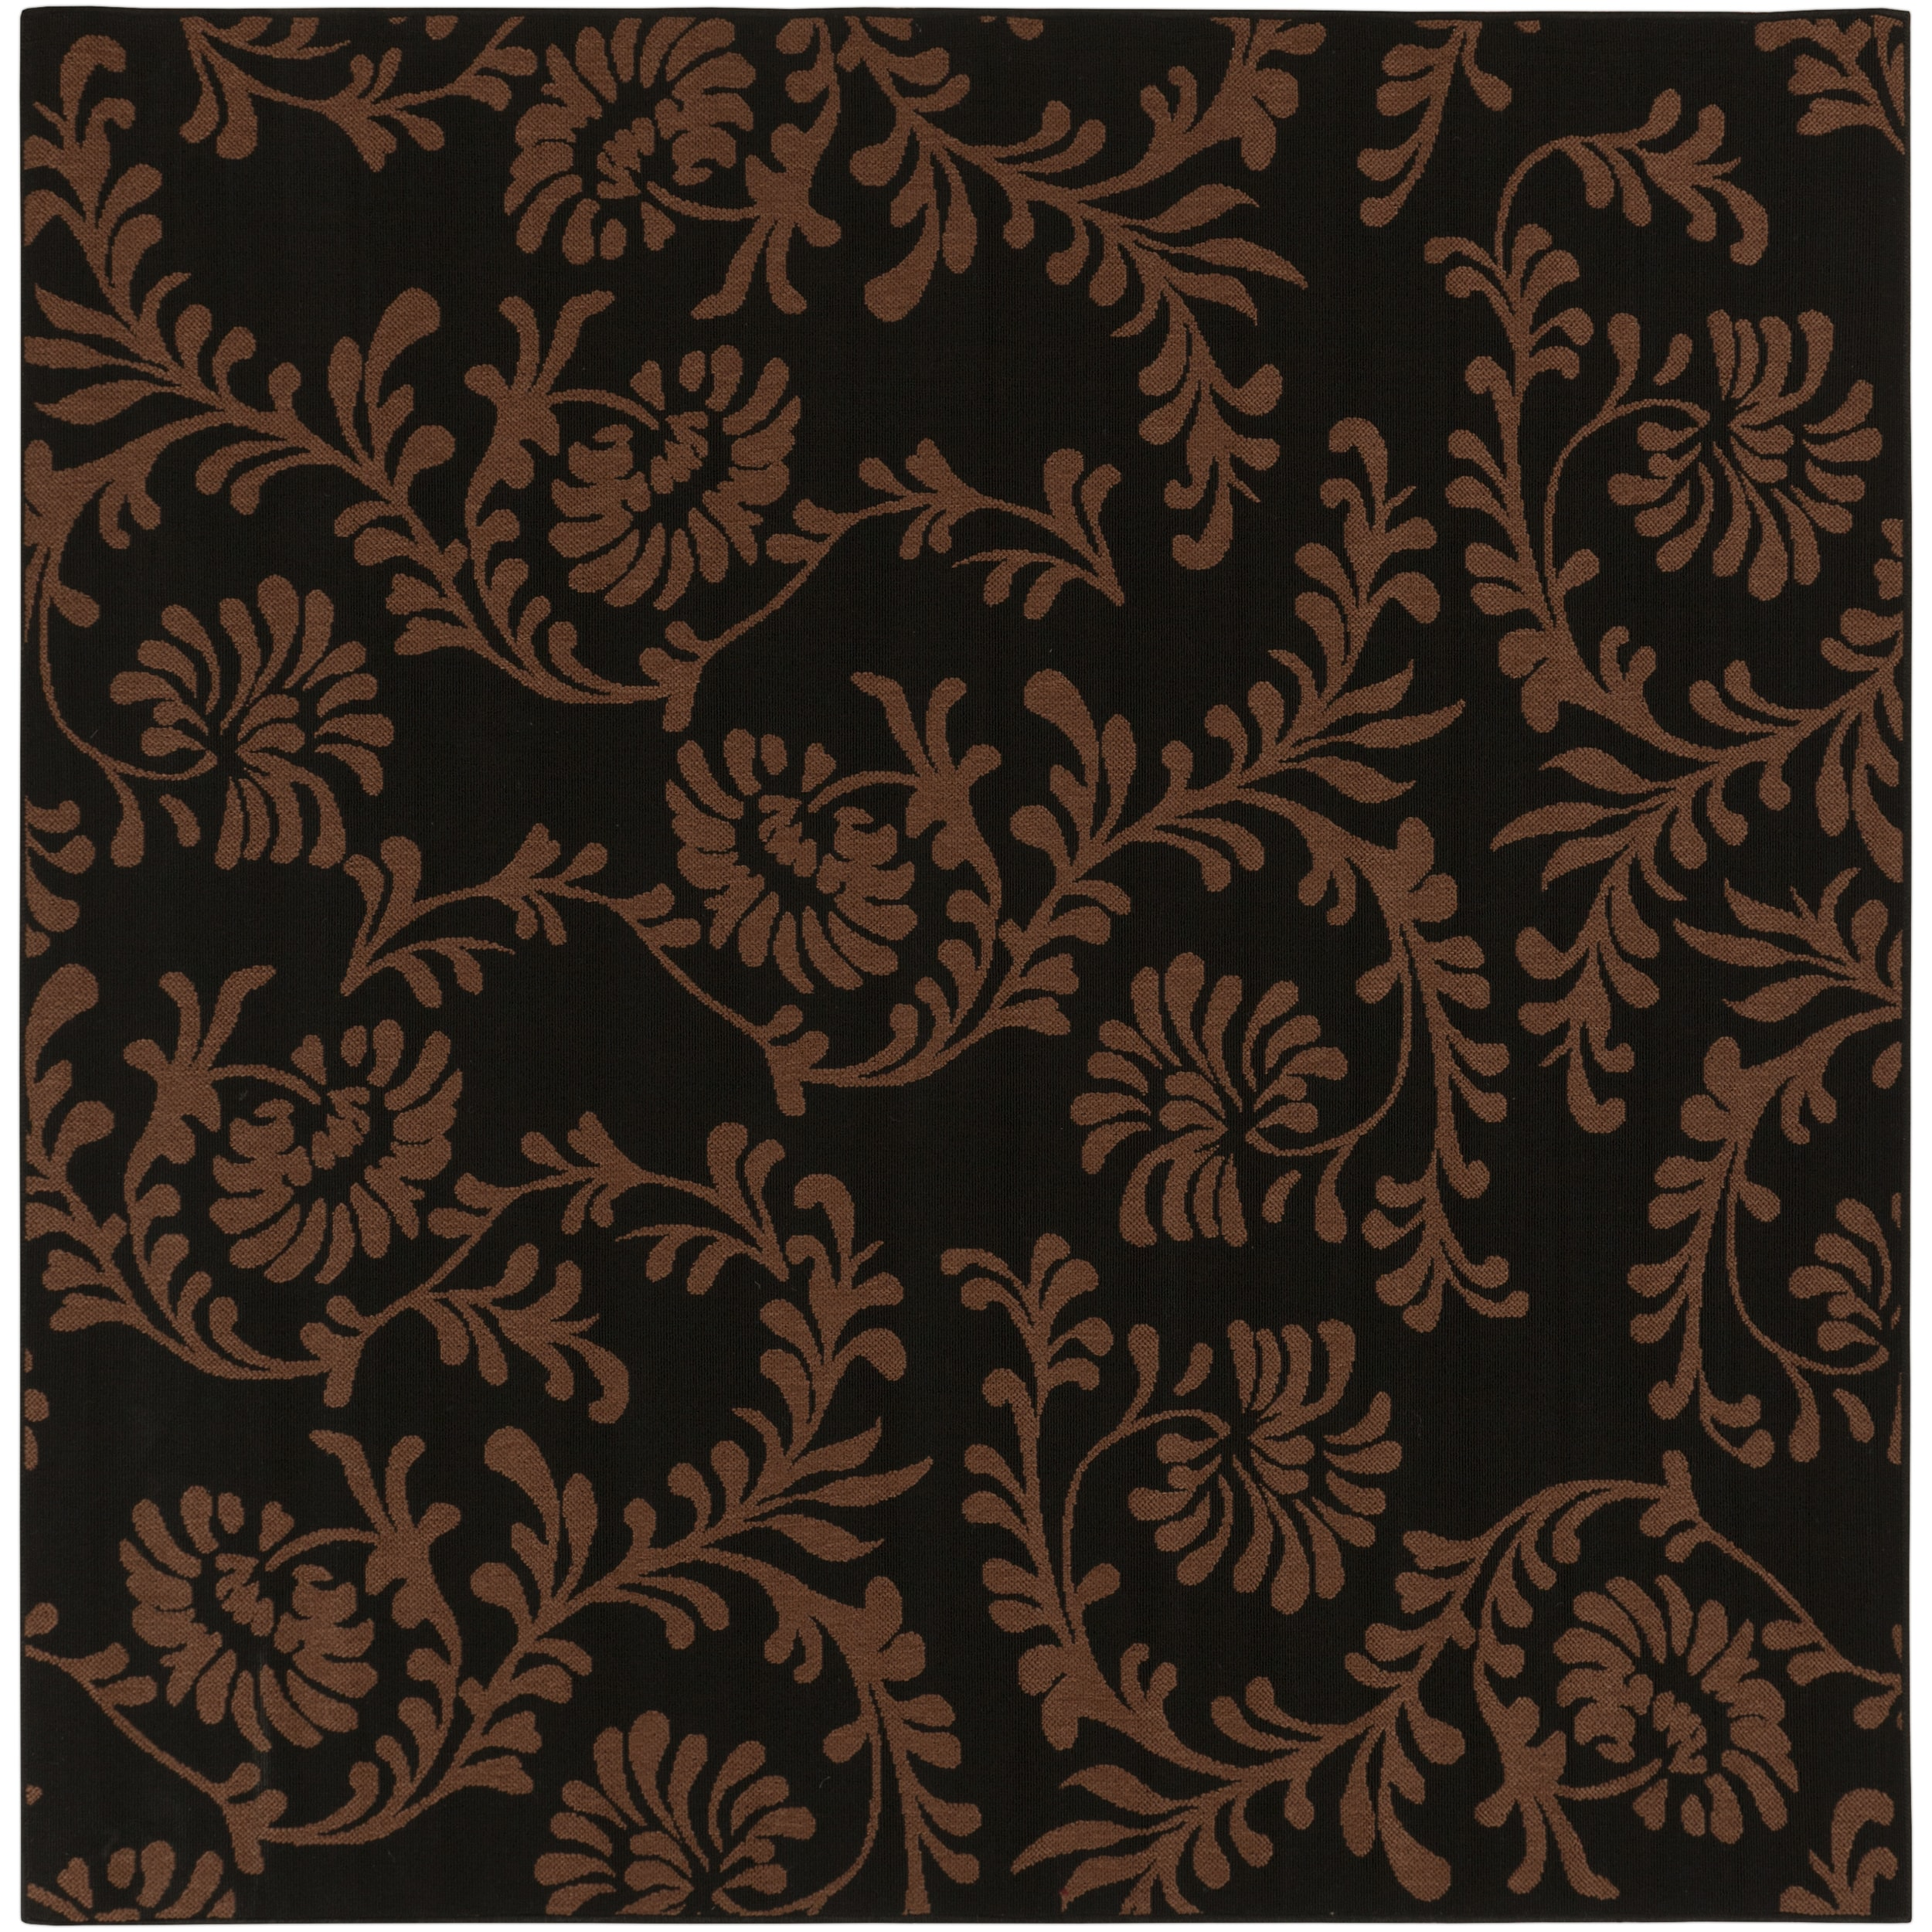 Lucerne Russet Floral Indoor/Outdoor Rug (7'3 x 7'3)